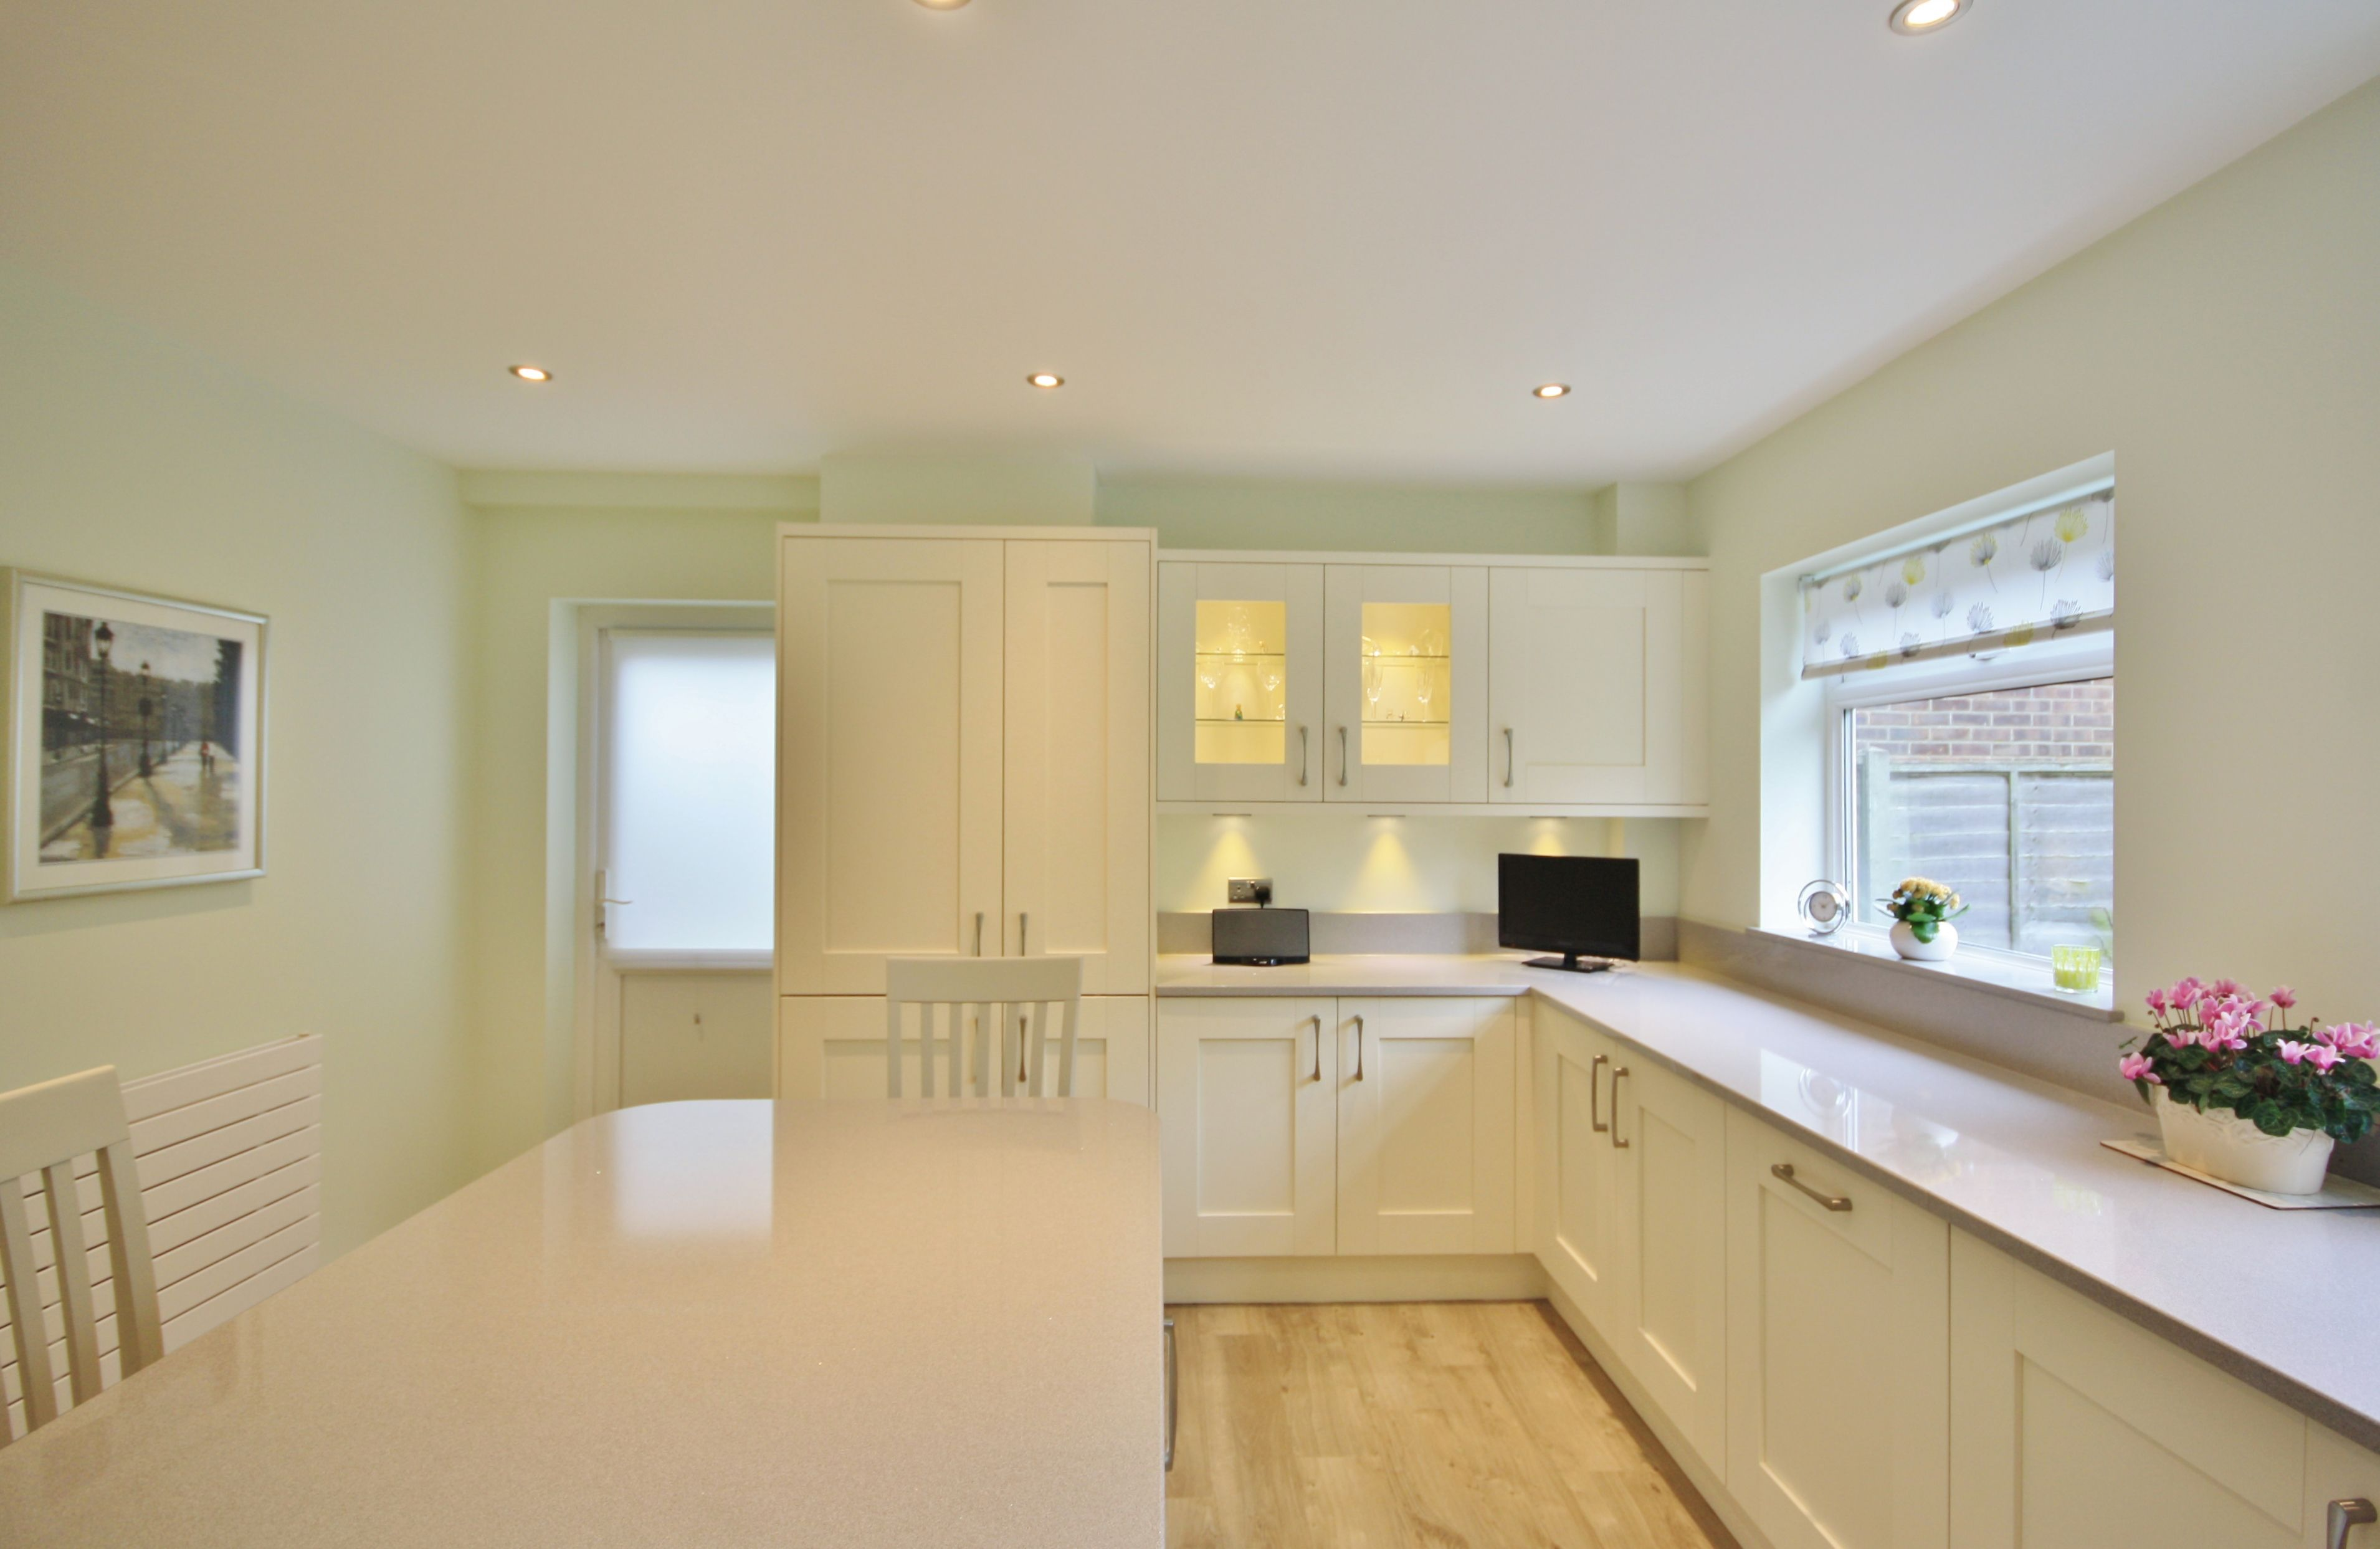 Shaker Kitchen Design In Ivory With Light Grey Worktops Shaker